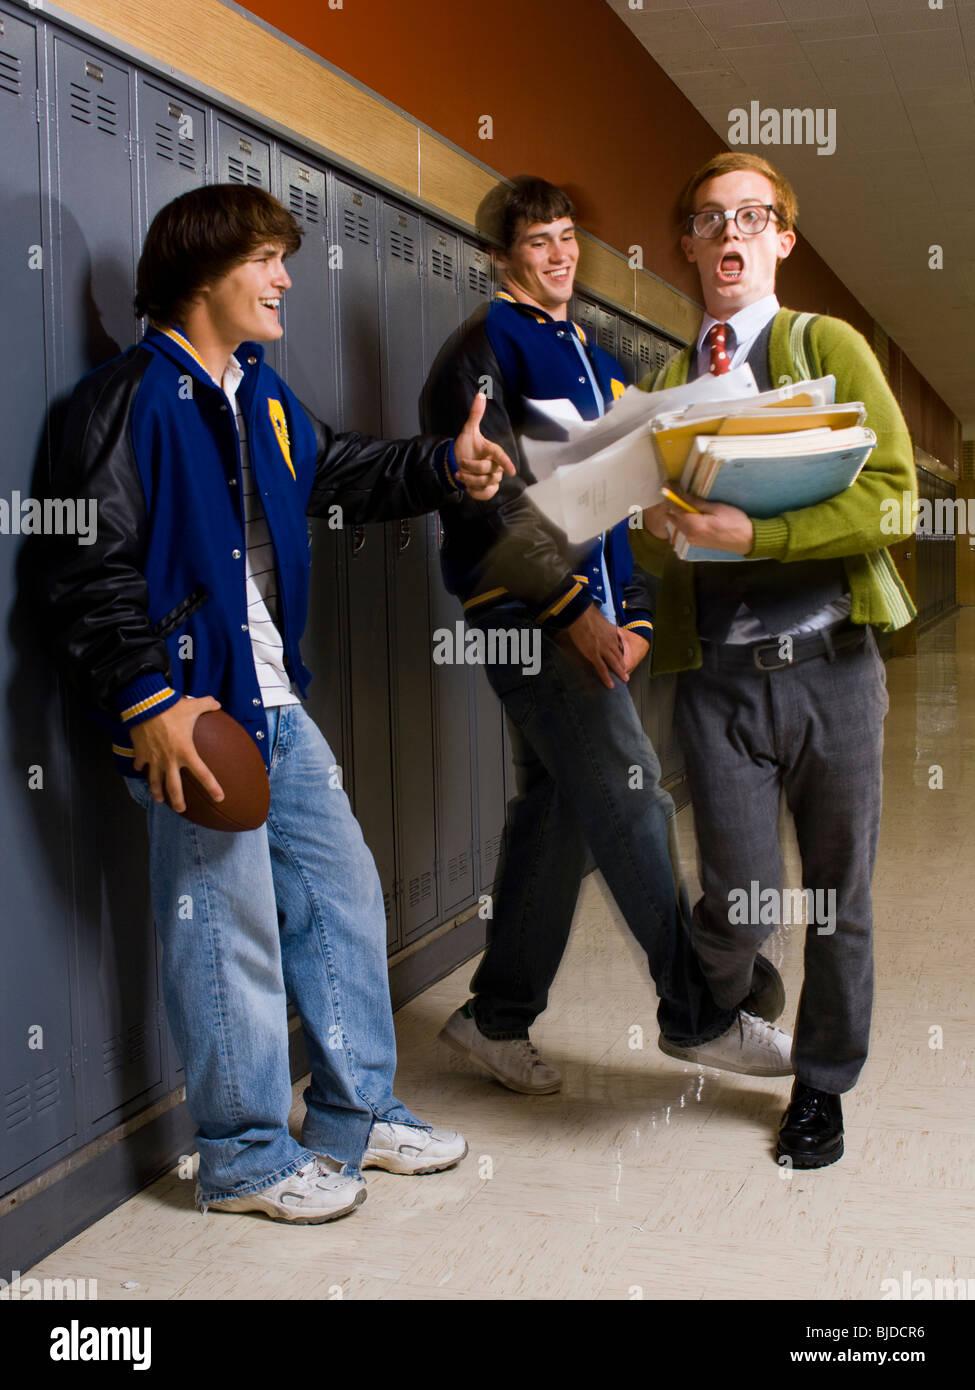 jocks-high-school-y-un-nerd-bjdcr6.jpg